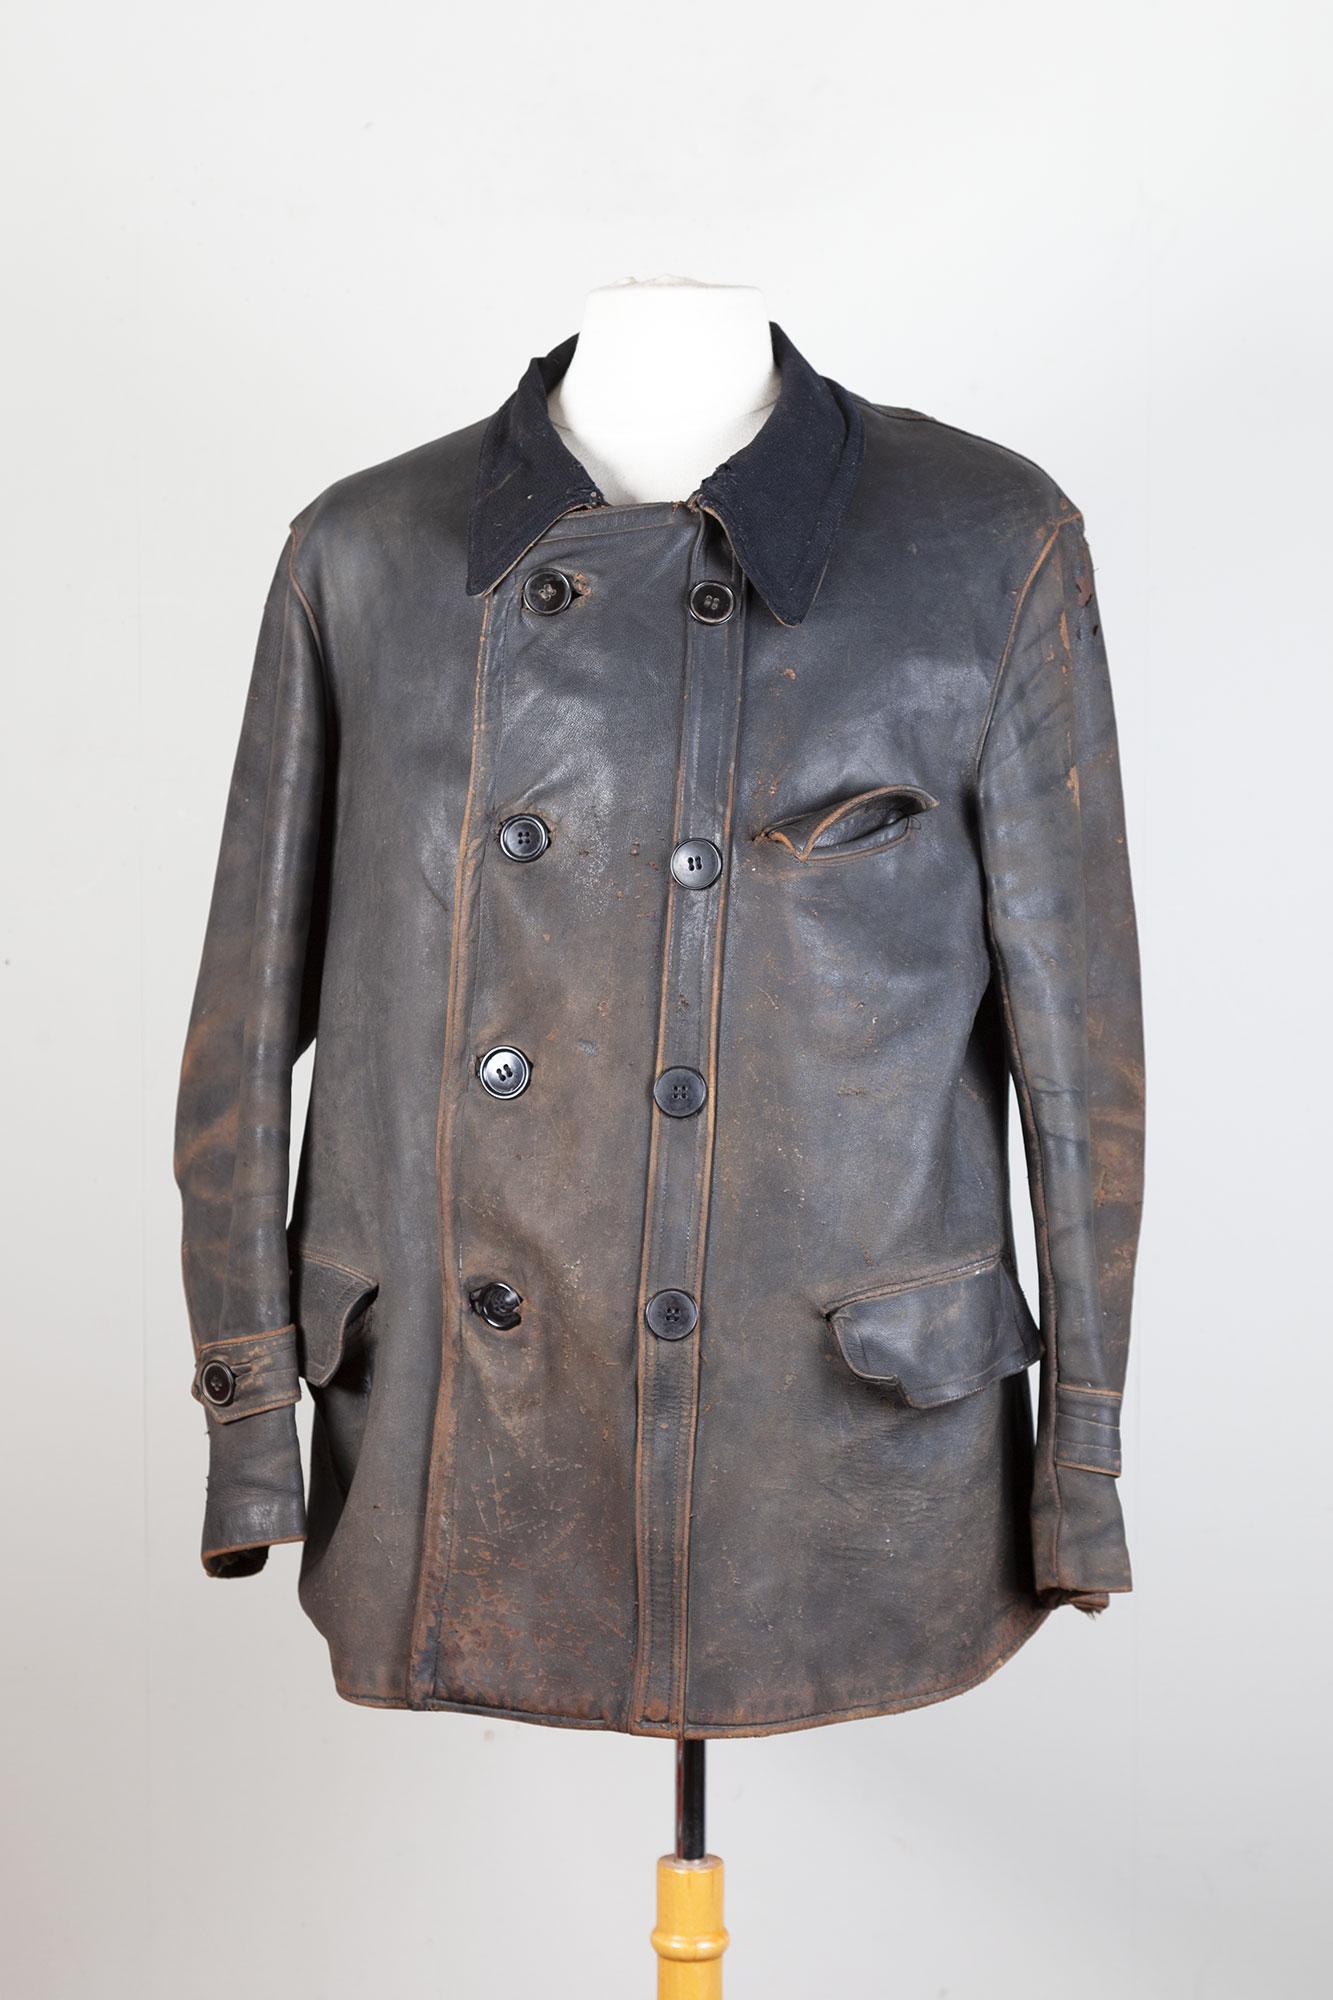 1930's Adolphe Lafont leather work shore jacket